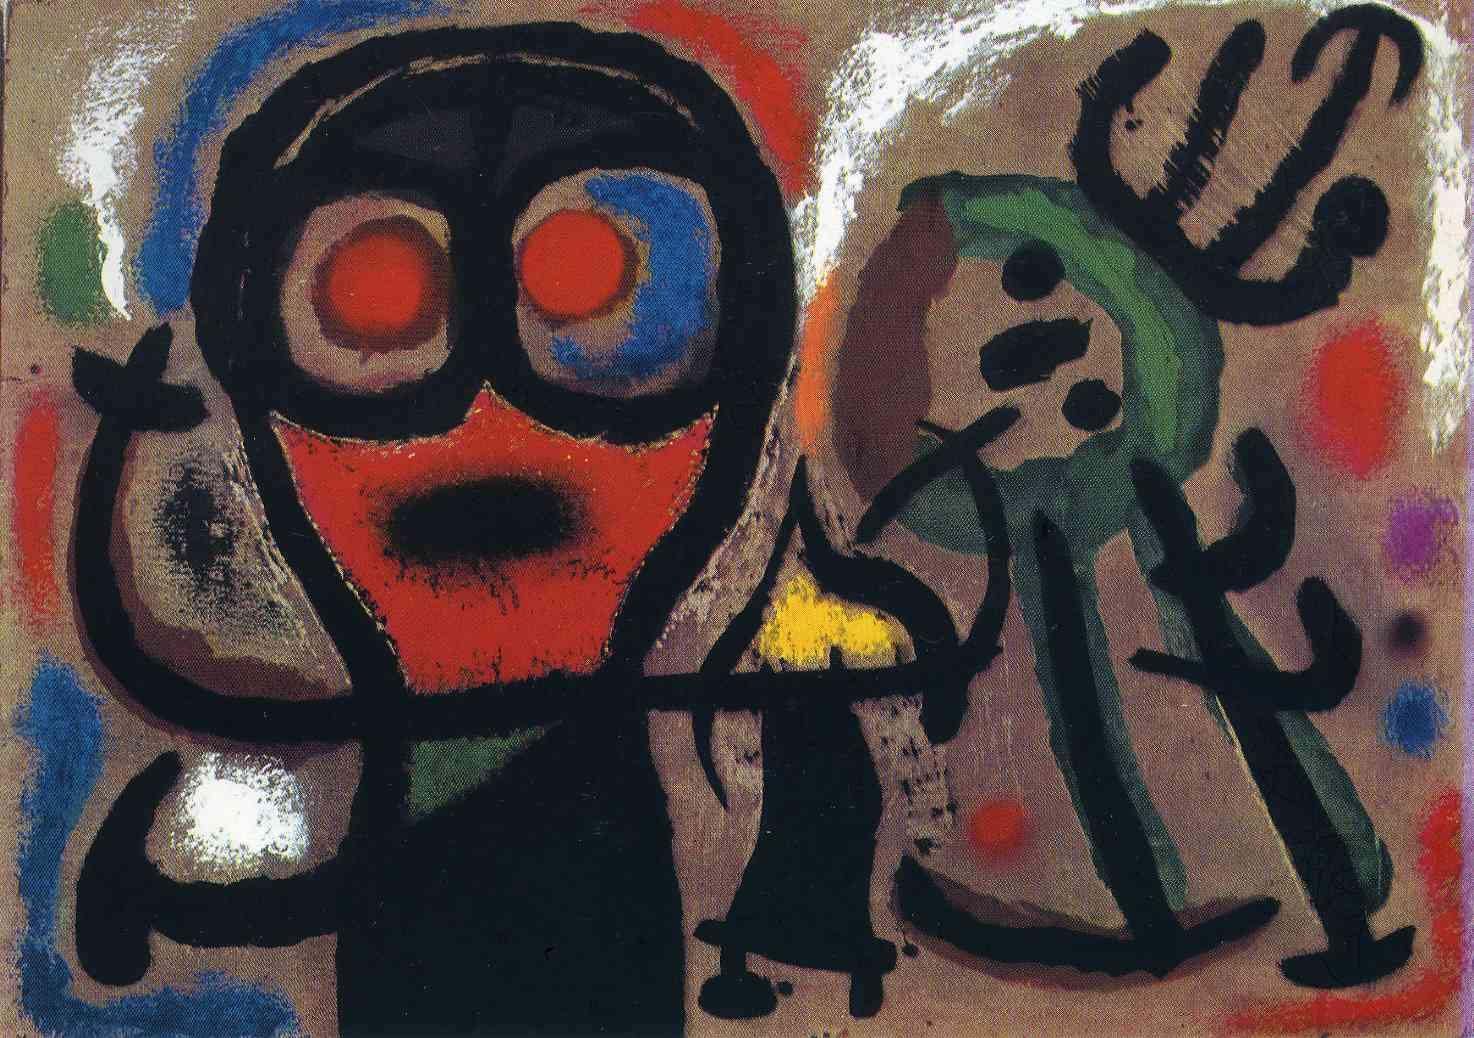 d15d2e7c8 Joan Miro (April 20, 1893 — December 25, 1983), Spaniard painter ...